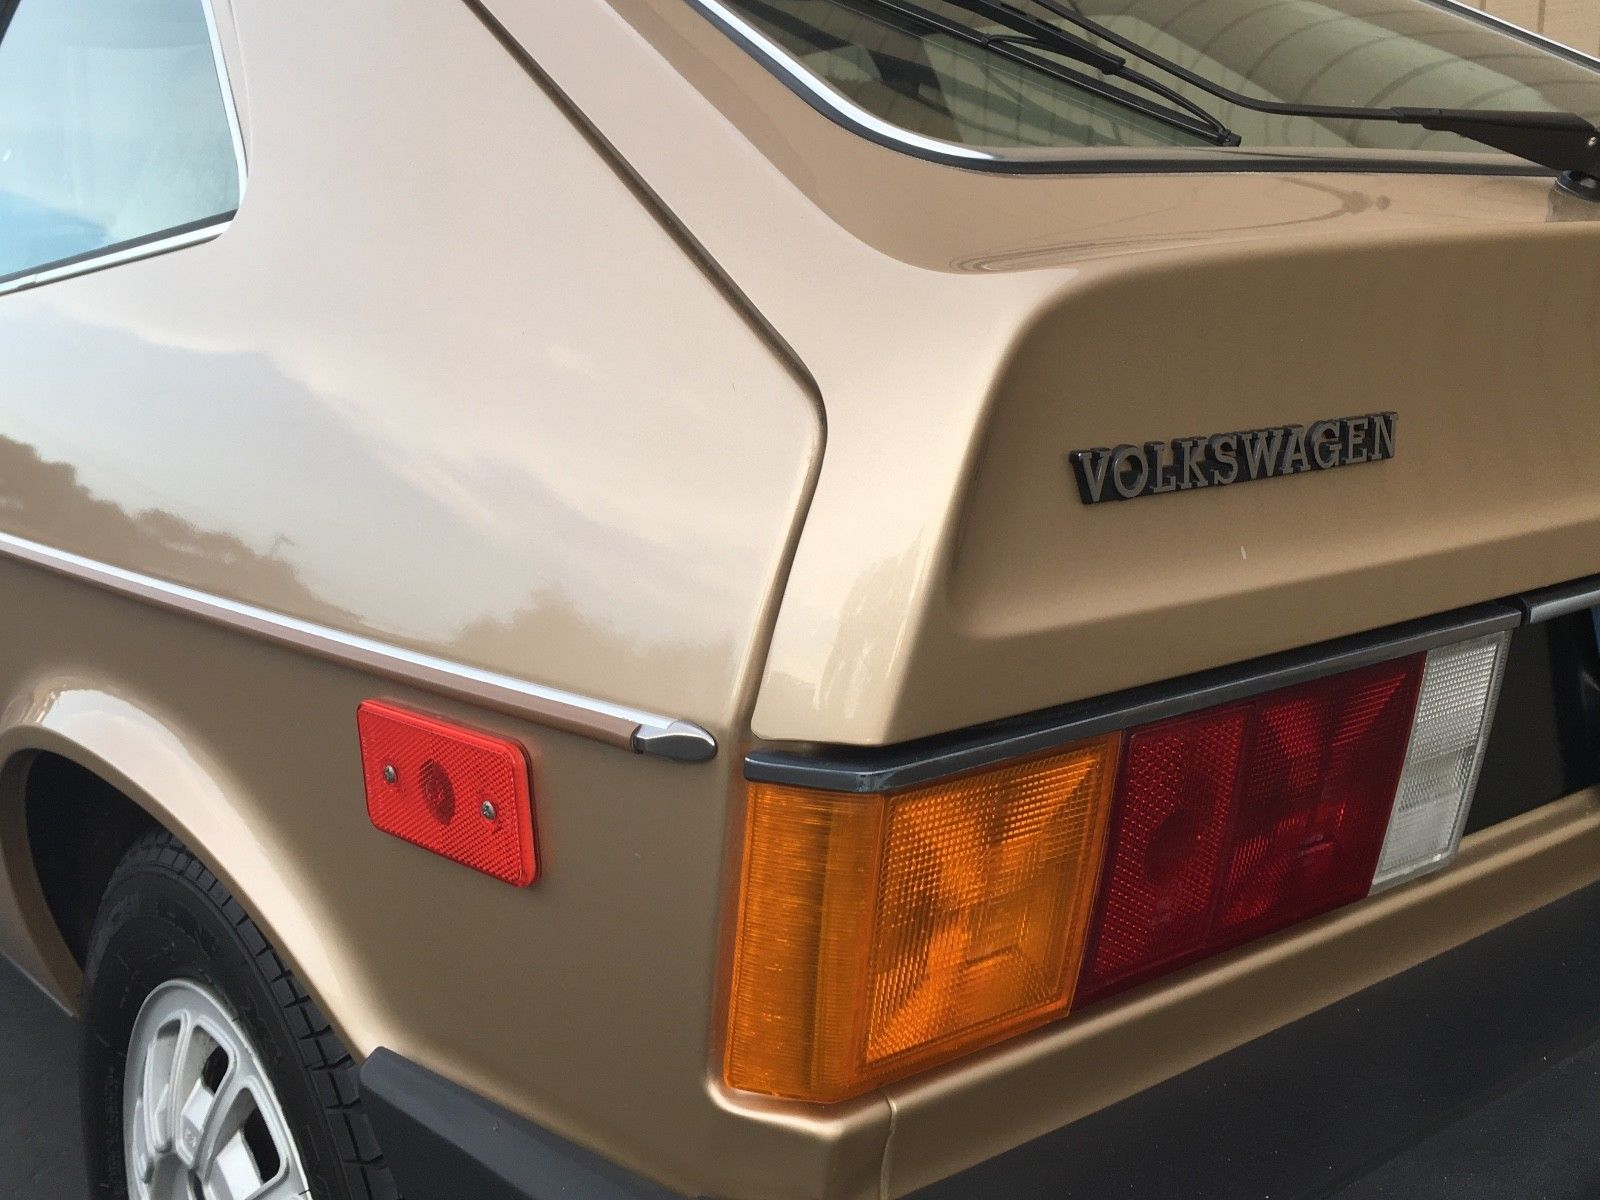 1978 Volkswagen Scirocco rear badge 2